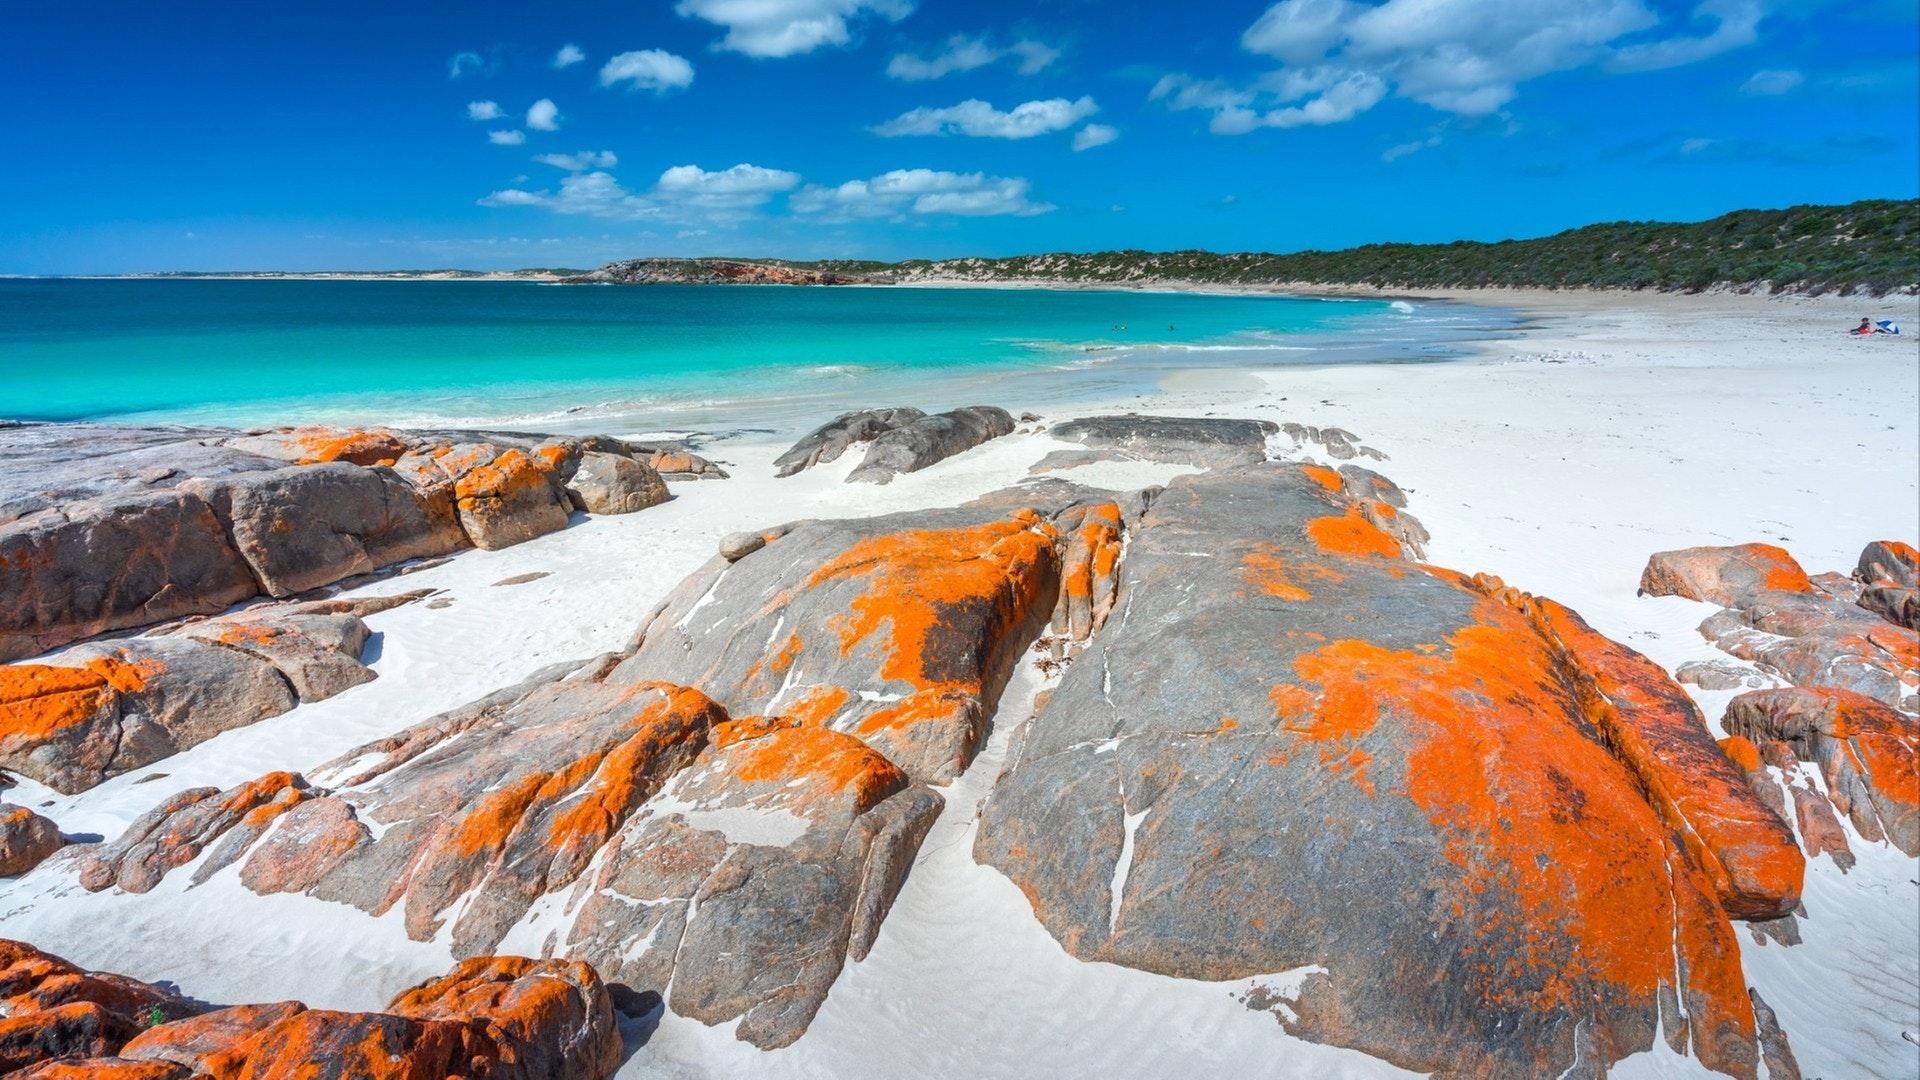 Dolphin Bay na Península de Yorke, Austrália Meridional